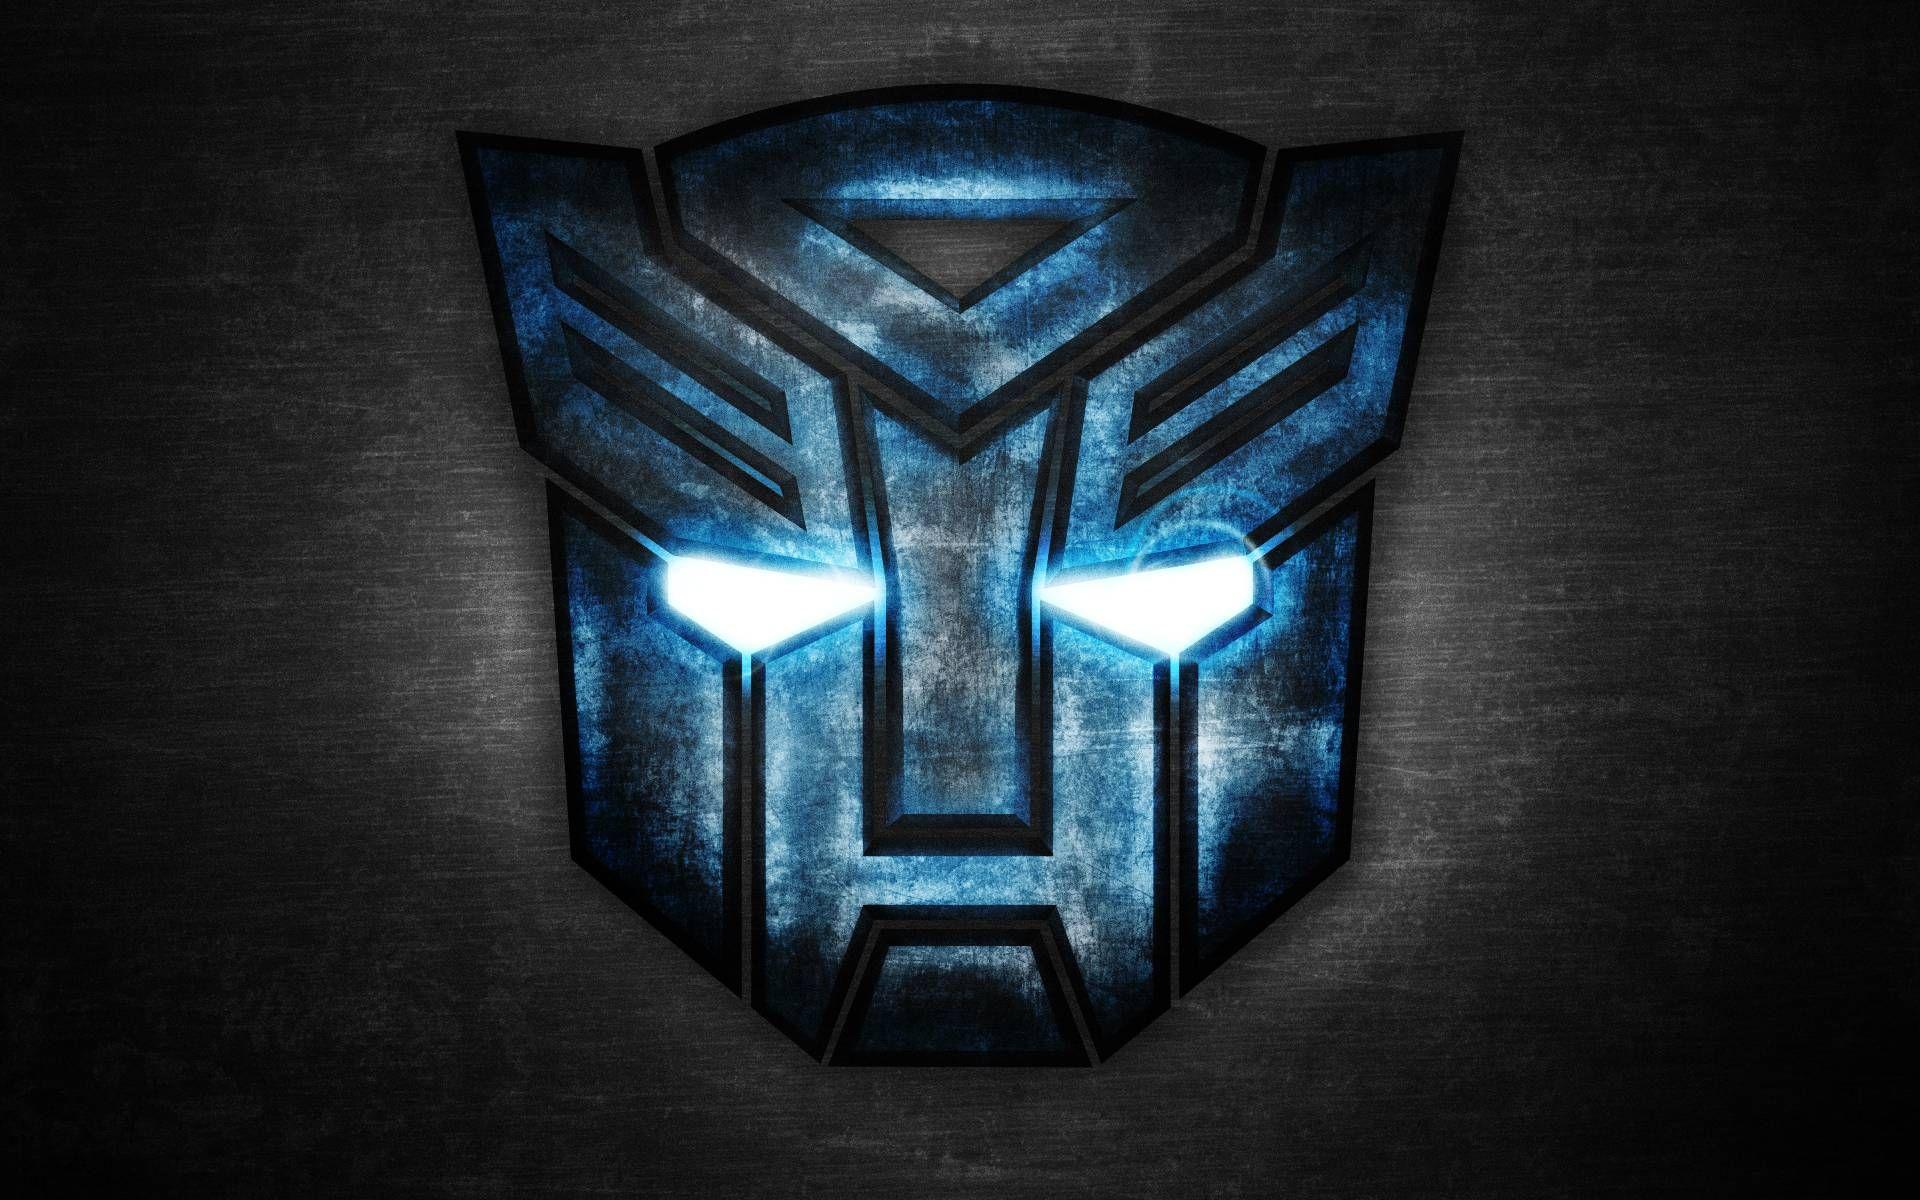 Transformers Wallpapers HD Wallpaper 1920x1200 42